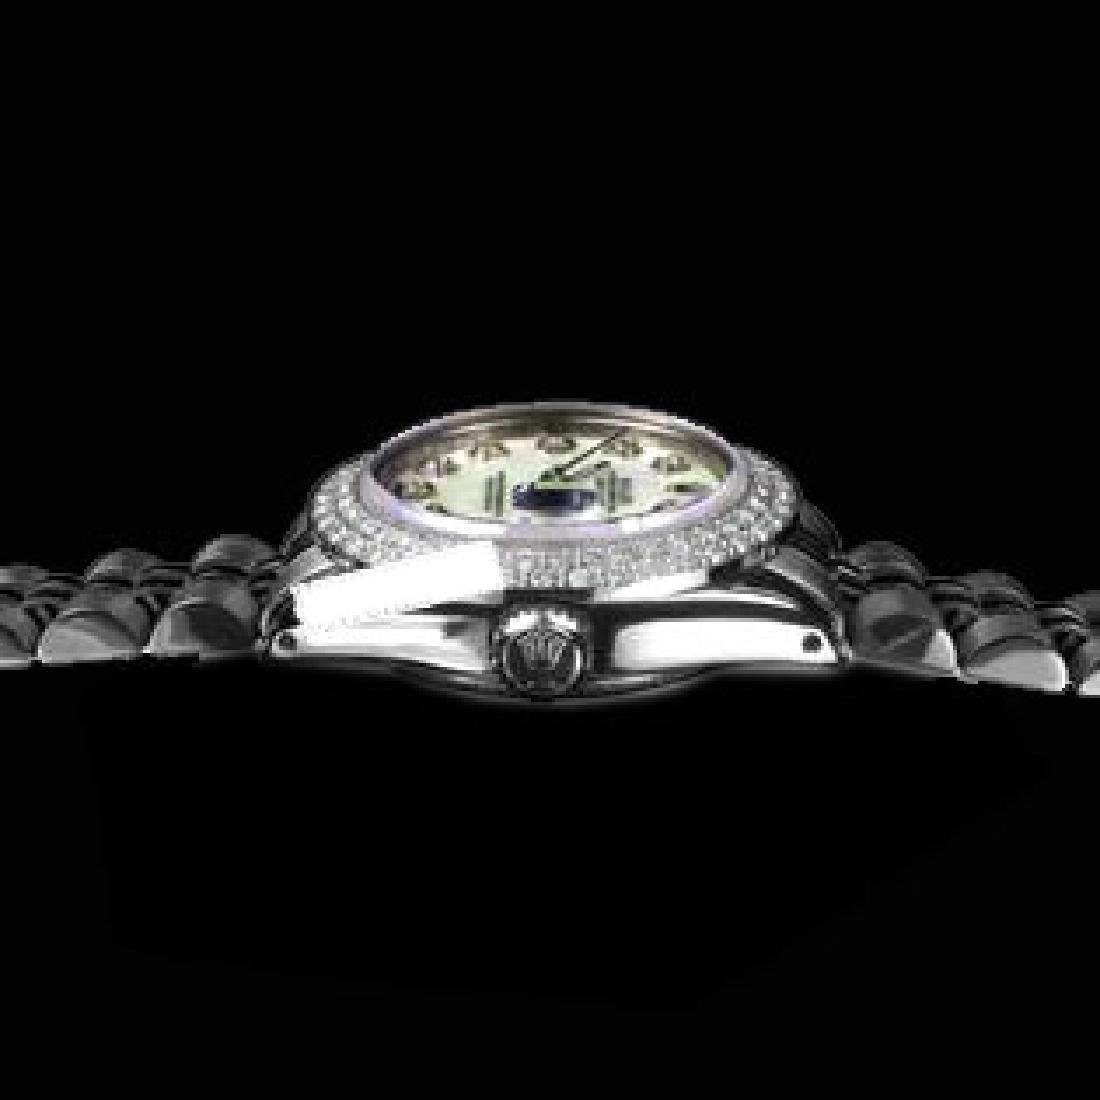 Rolex Men's Stainless Steel, QuickSet, Diamond Dial & - 3